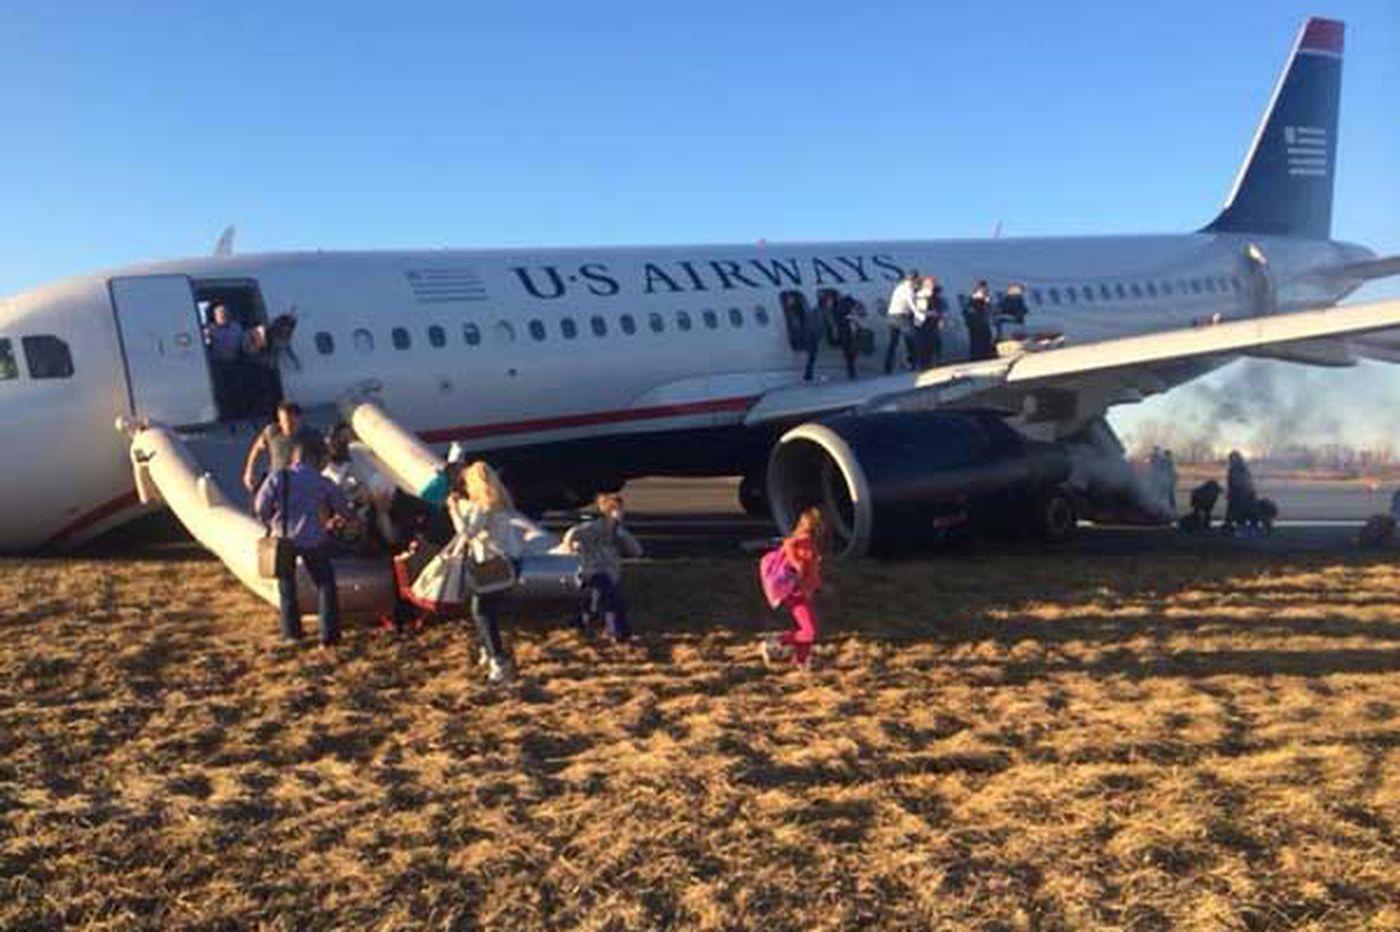 US Airways crash last year likely due to pilot error